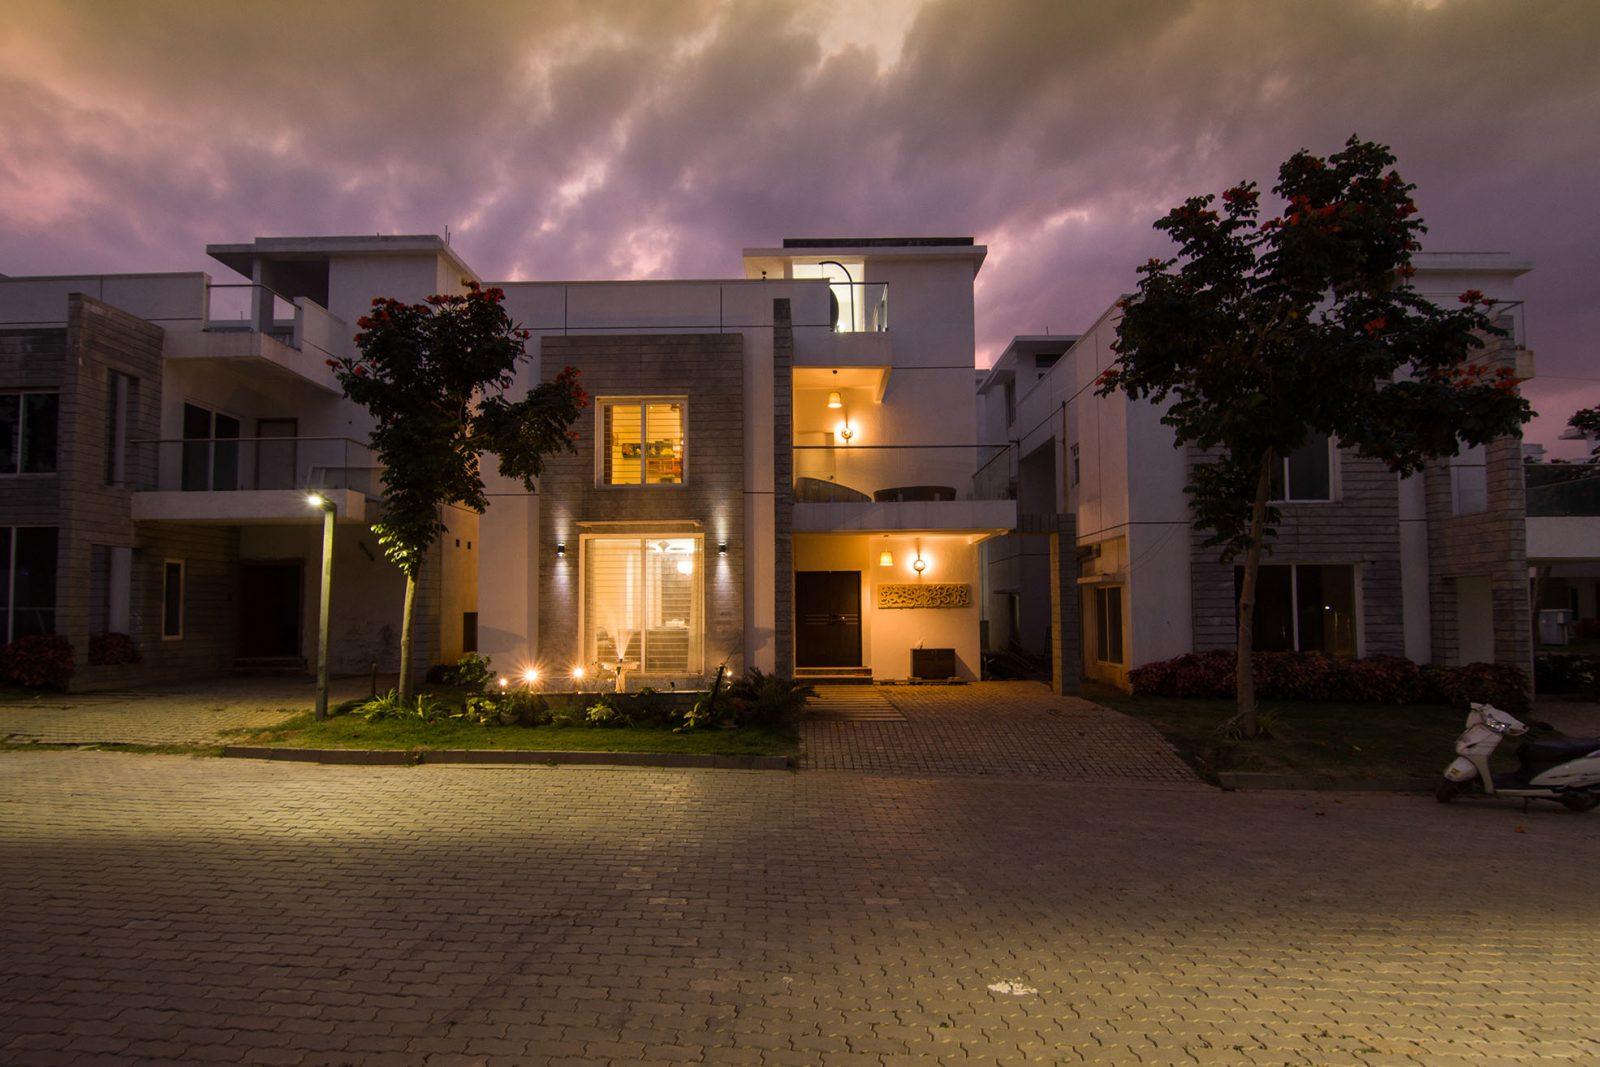 BlueJay Aster villas - Premium Luxury Villas - lightings